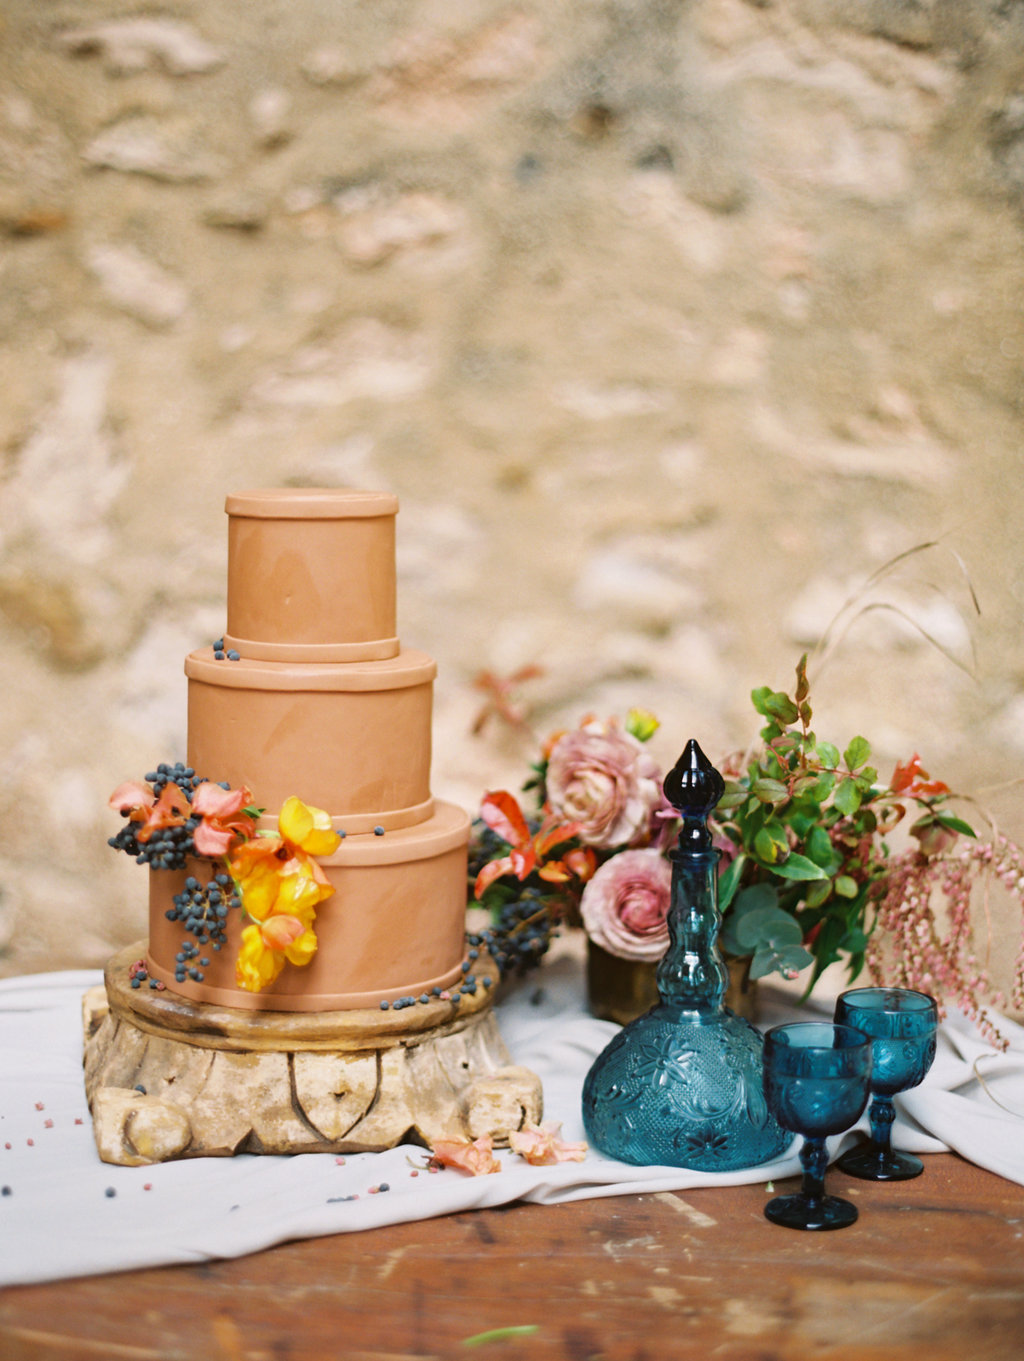 chocolate wedding cakes - photo by Charla Storey https://ruffledblog.com/architectural-san-antonio-mission-wedding-inspiration